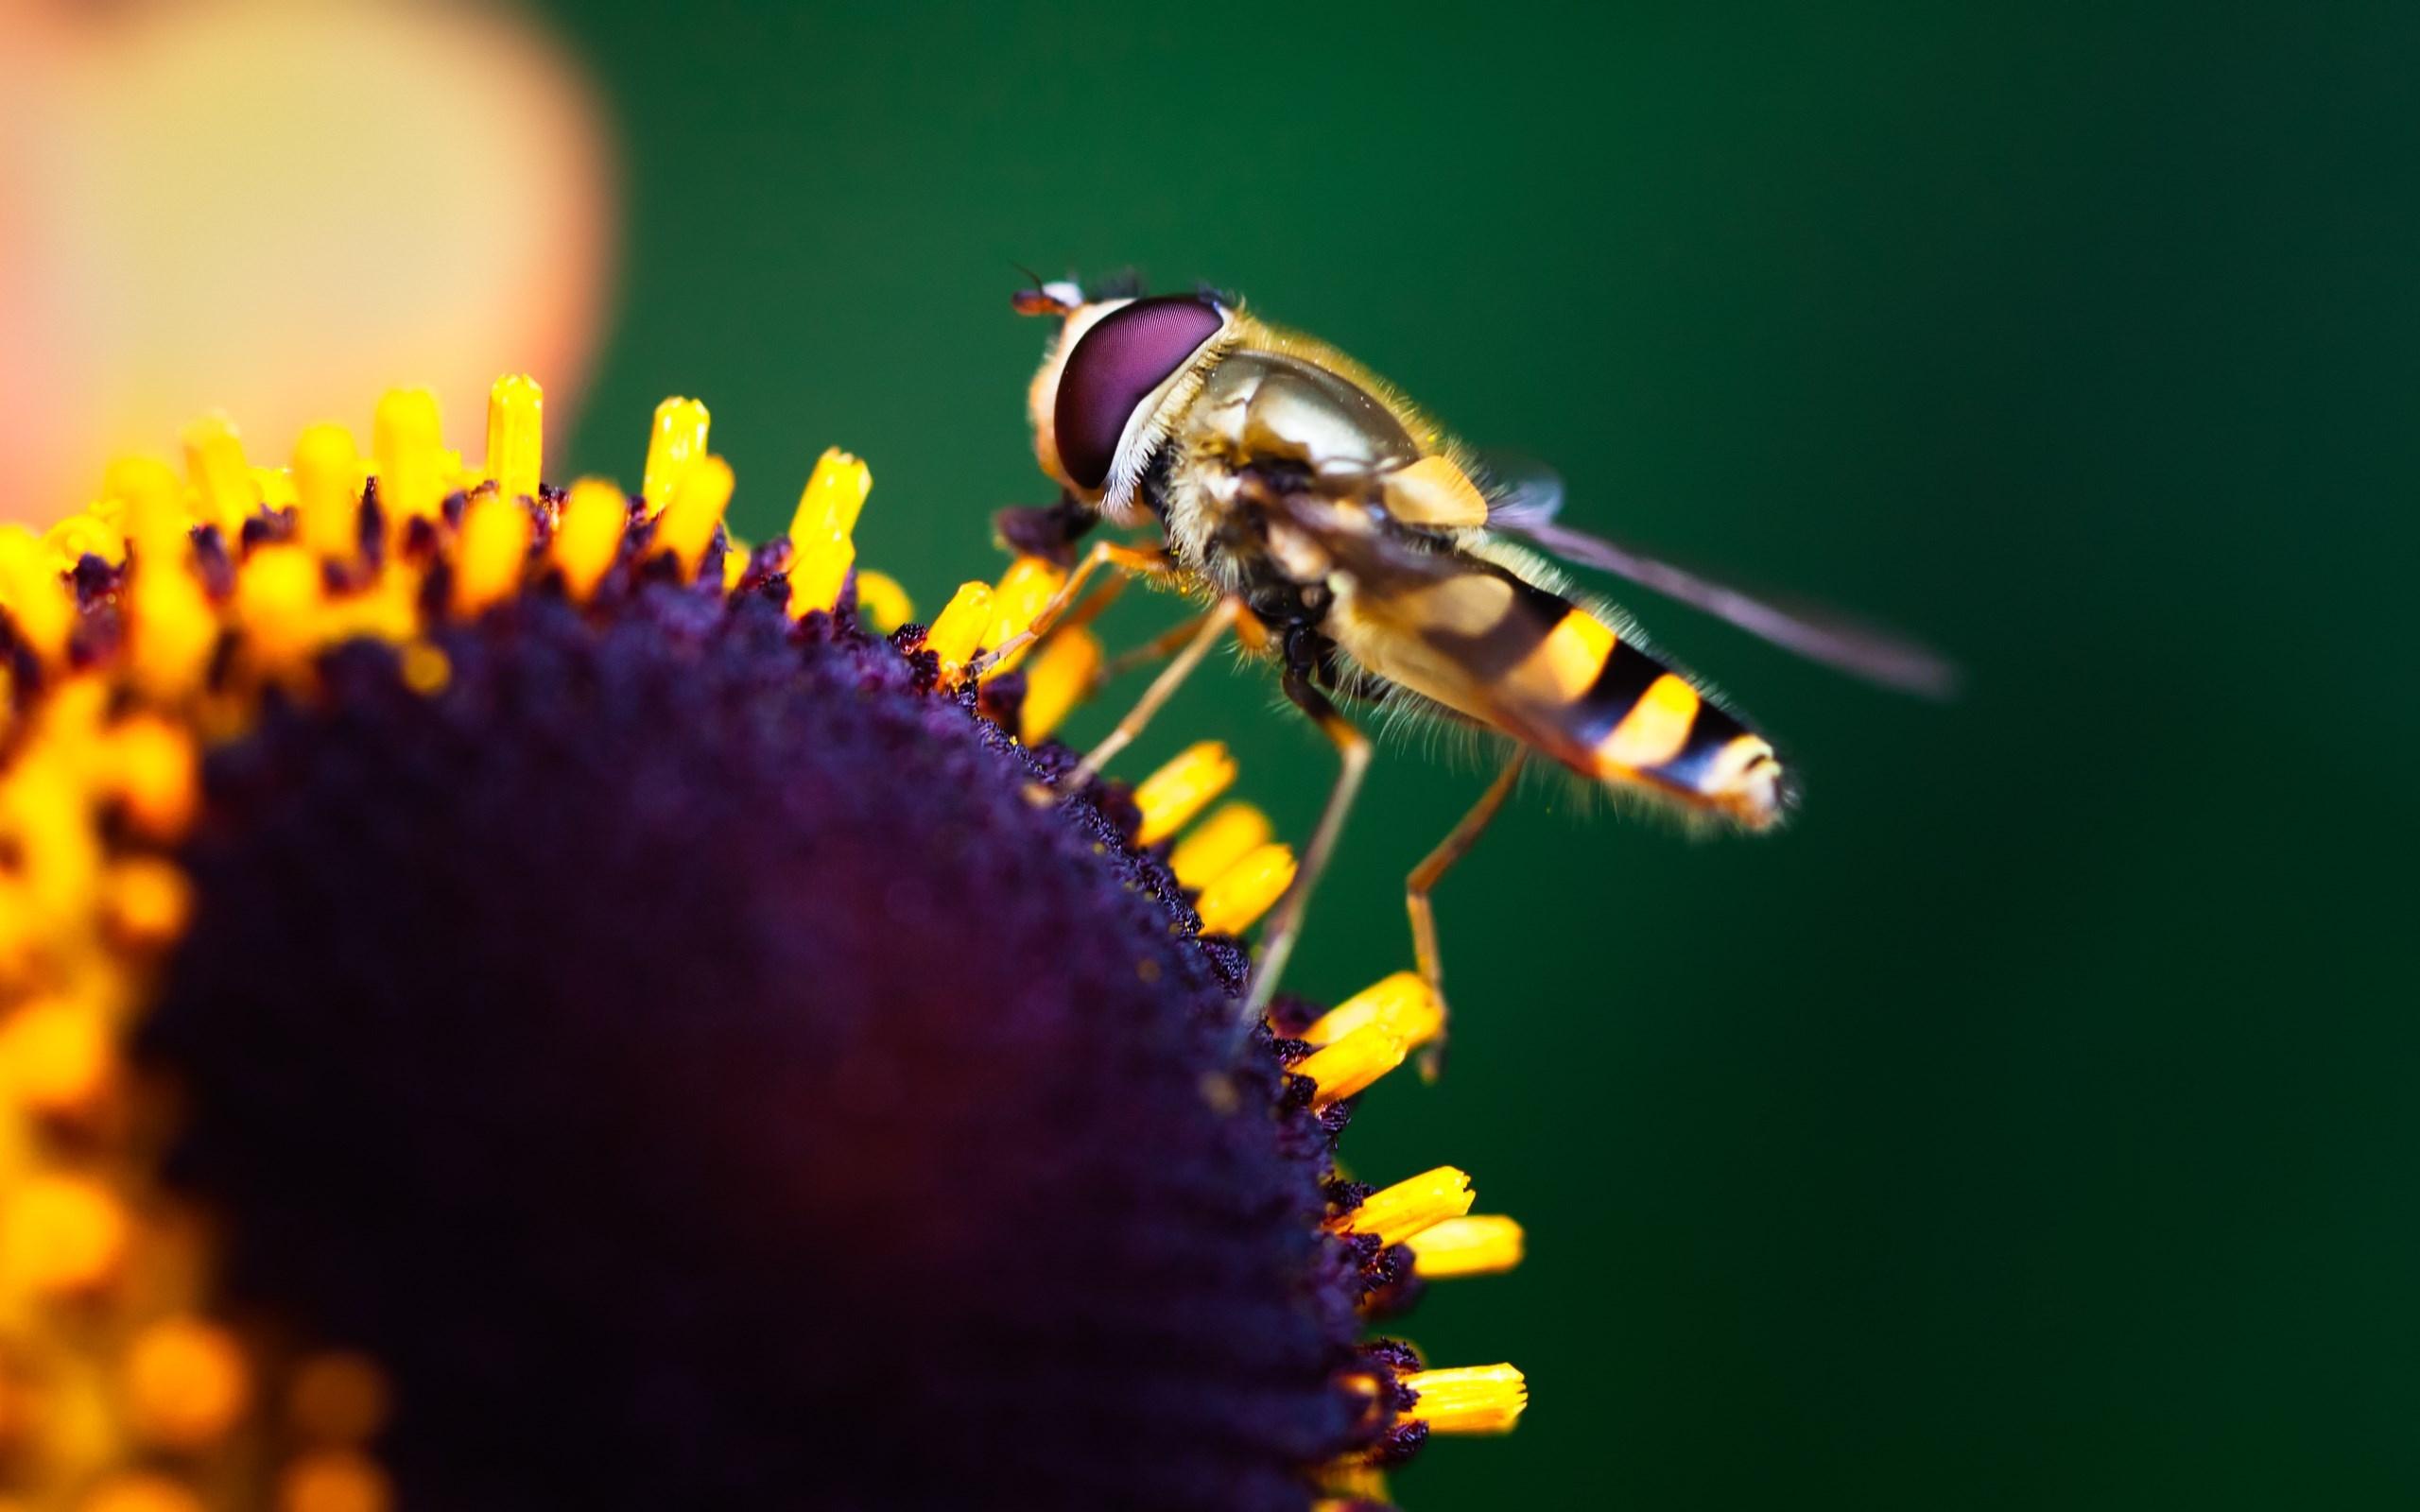 Macro Flower Insect HD Wallpaper